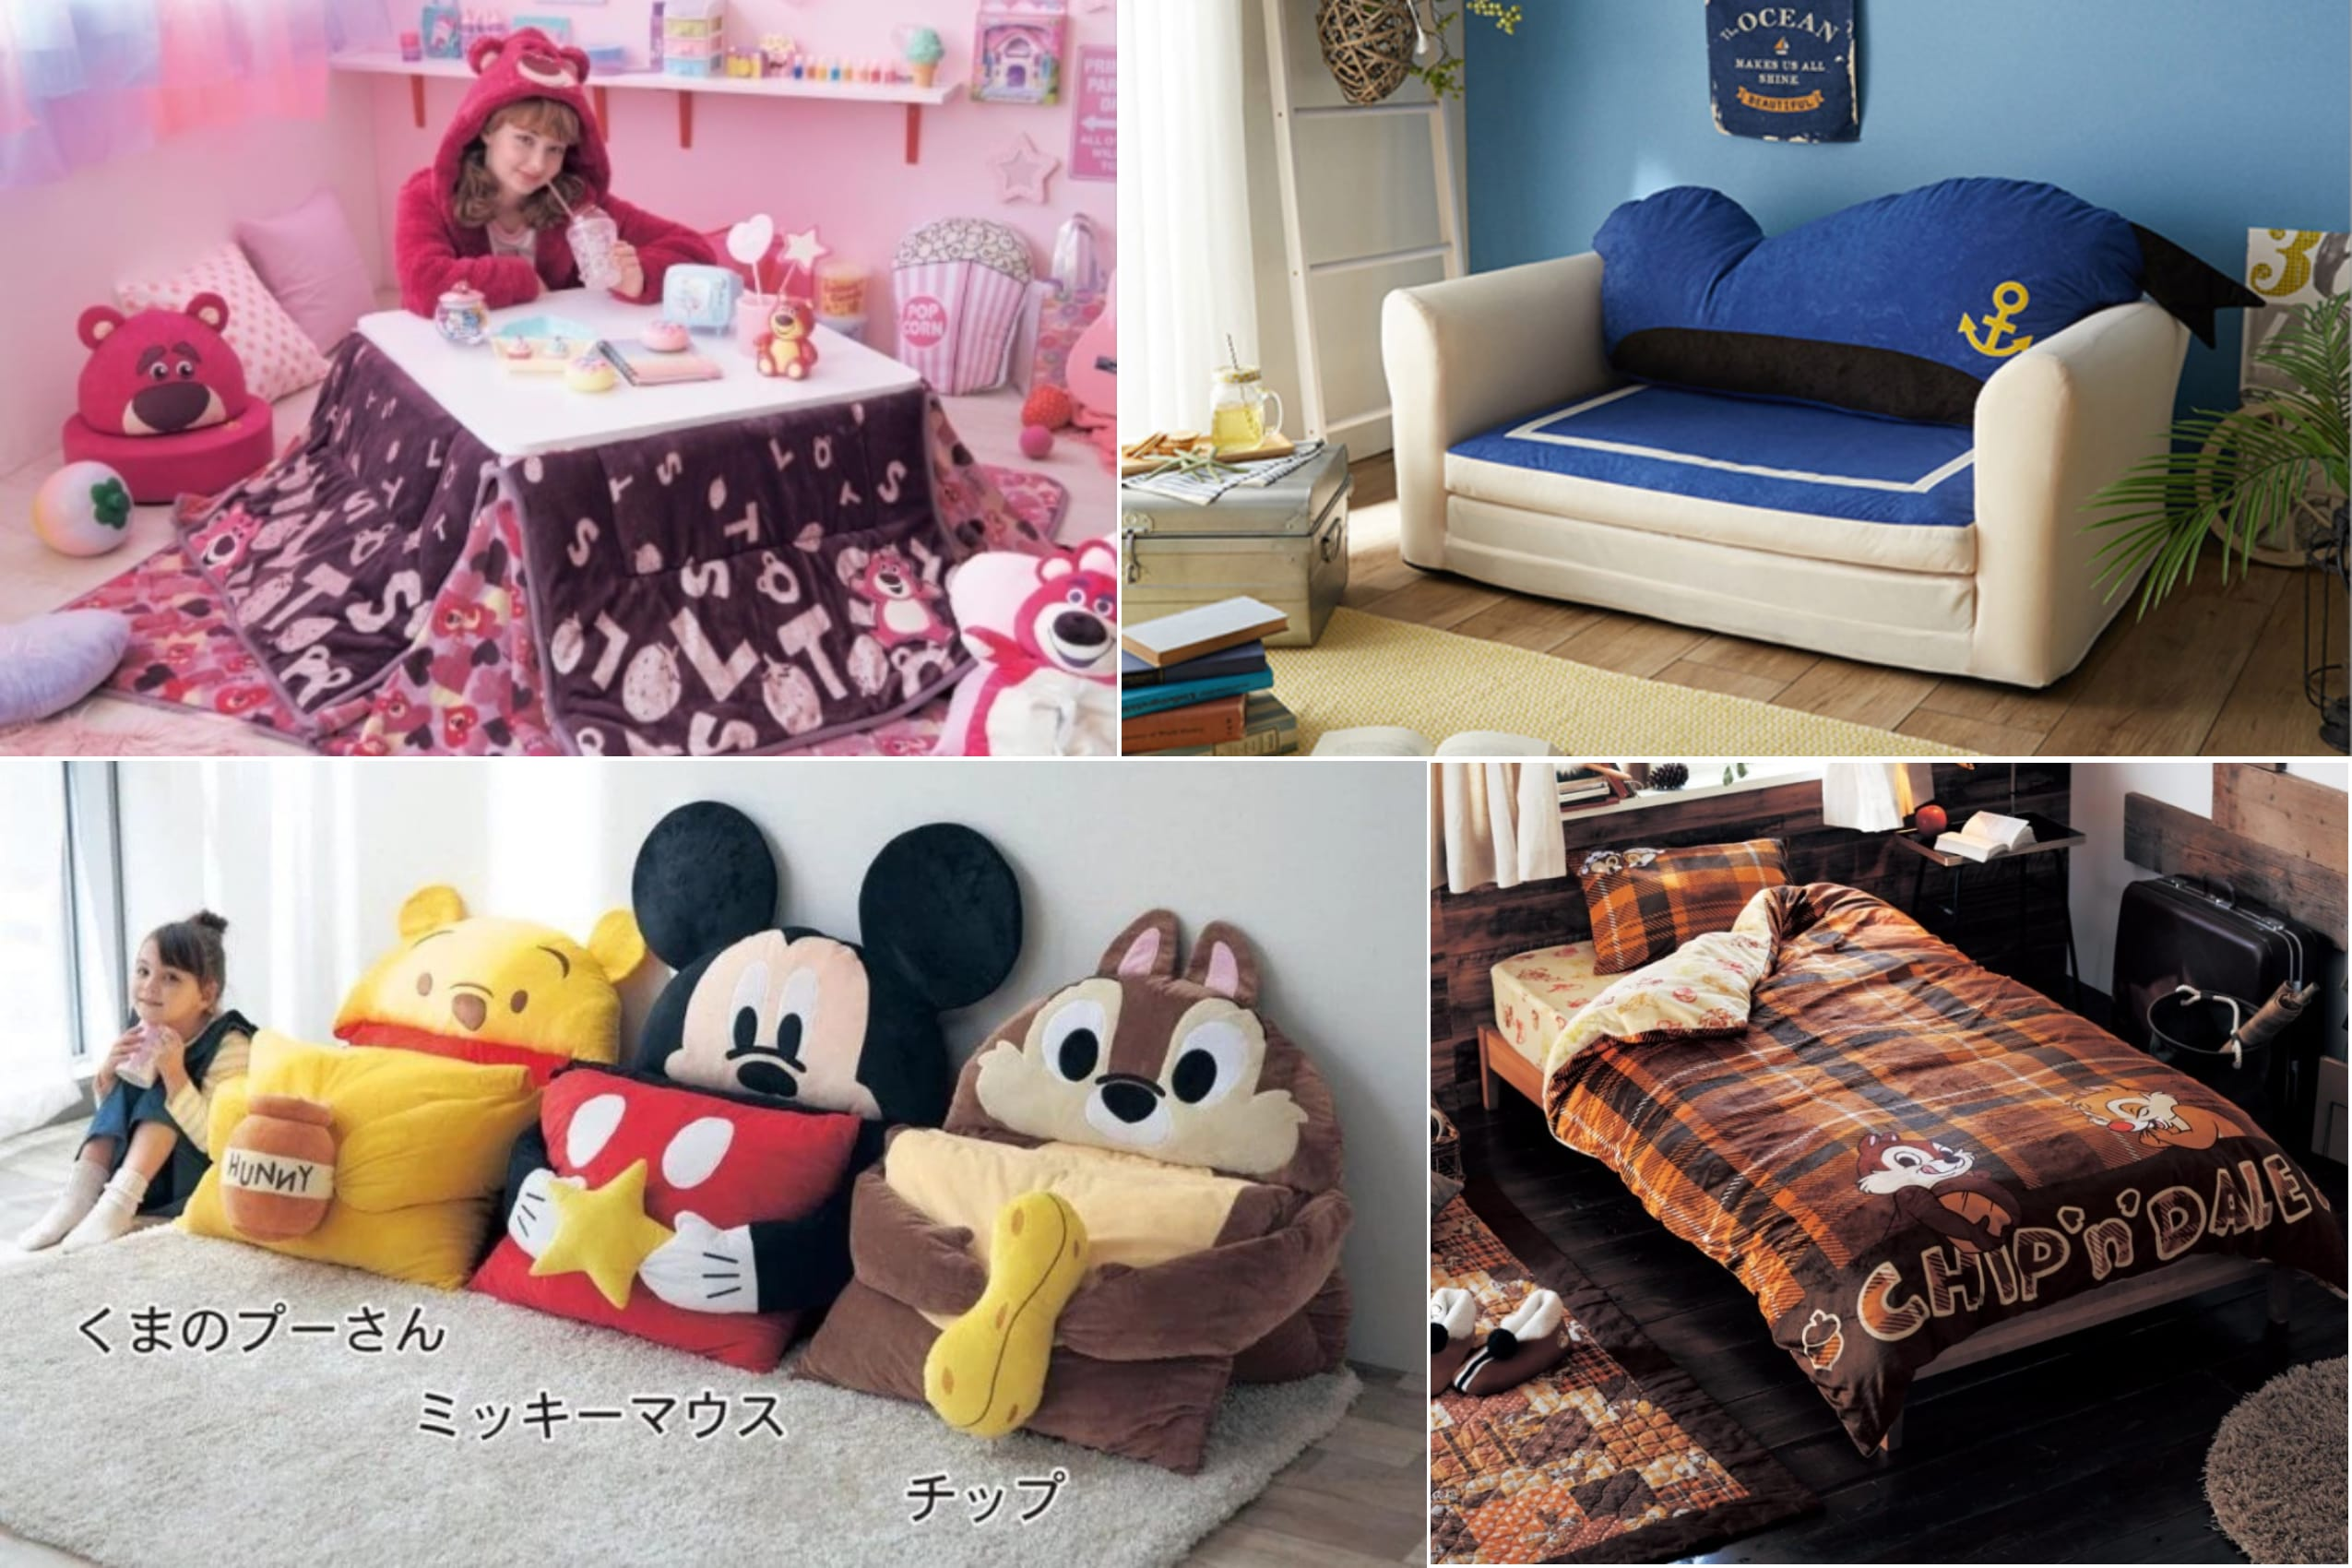 https://res.cloudinary.com/www-designidk-com/image/upload/v1622686881/articles/8484/disney-furniture-household_txutrj.jpg